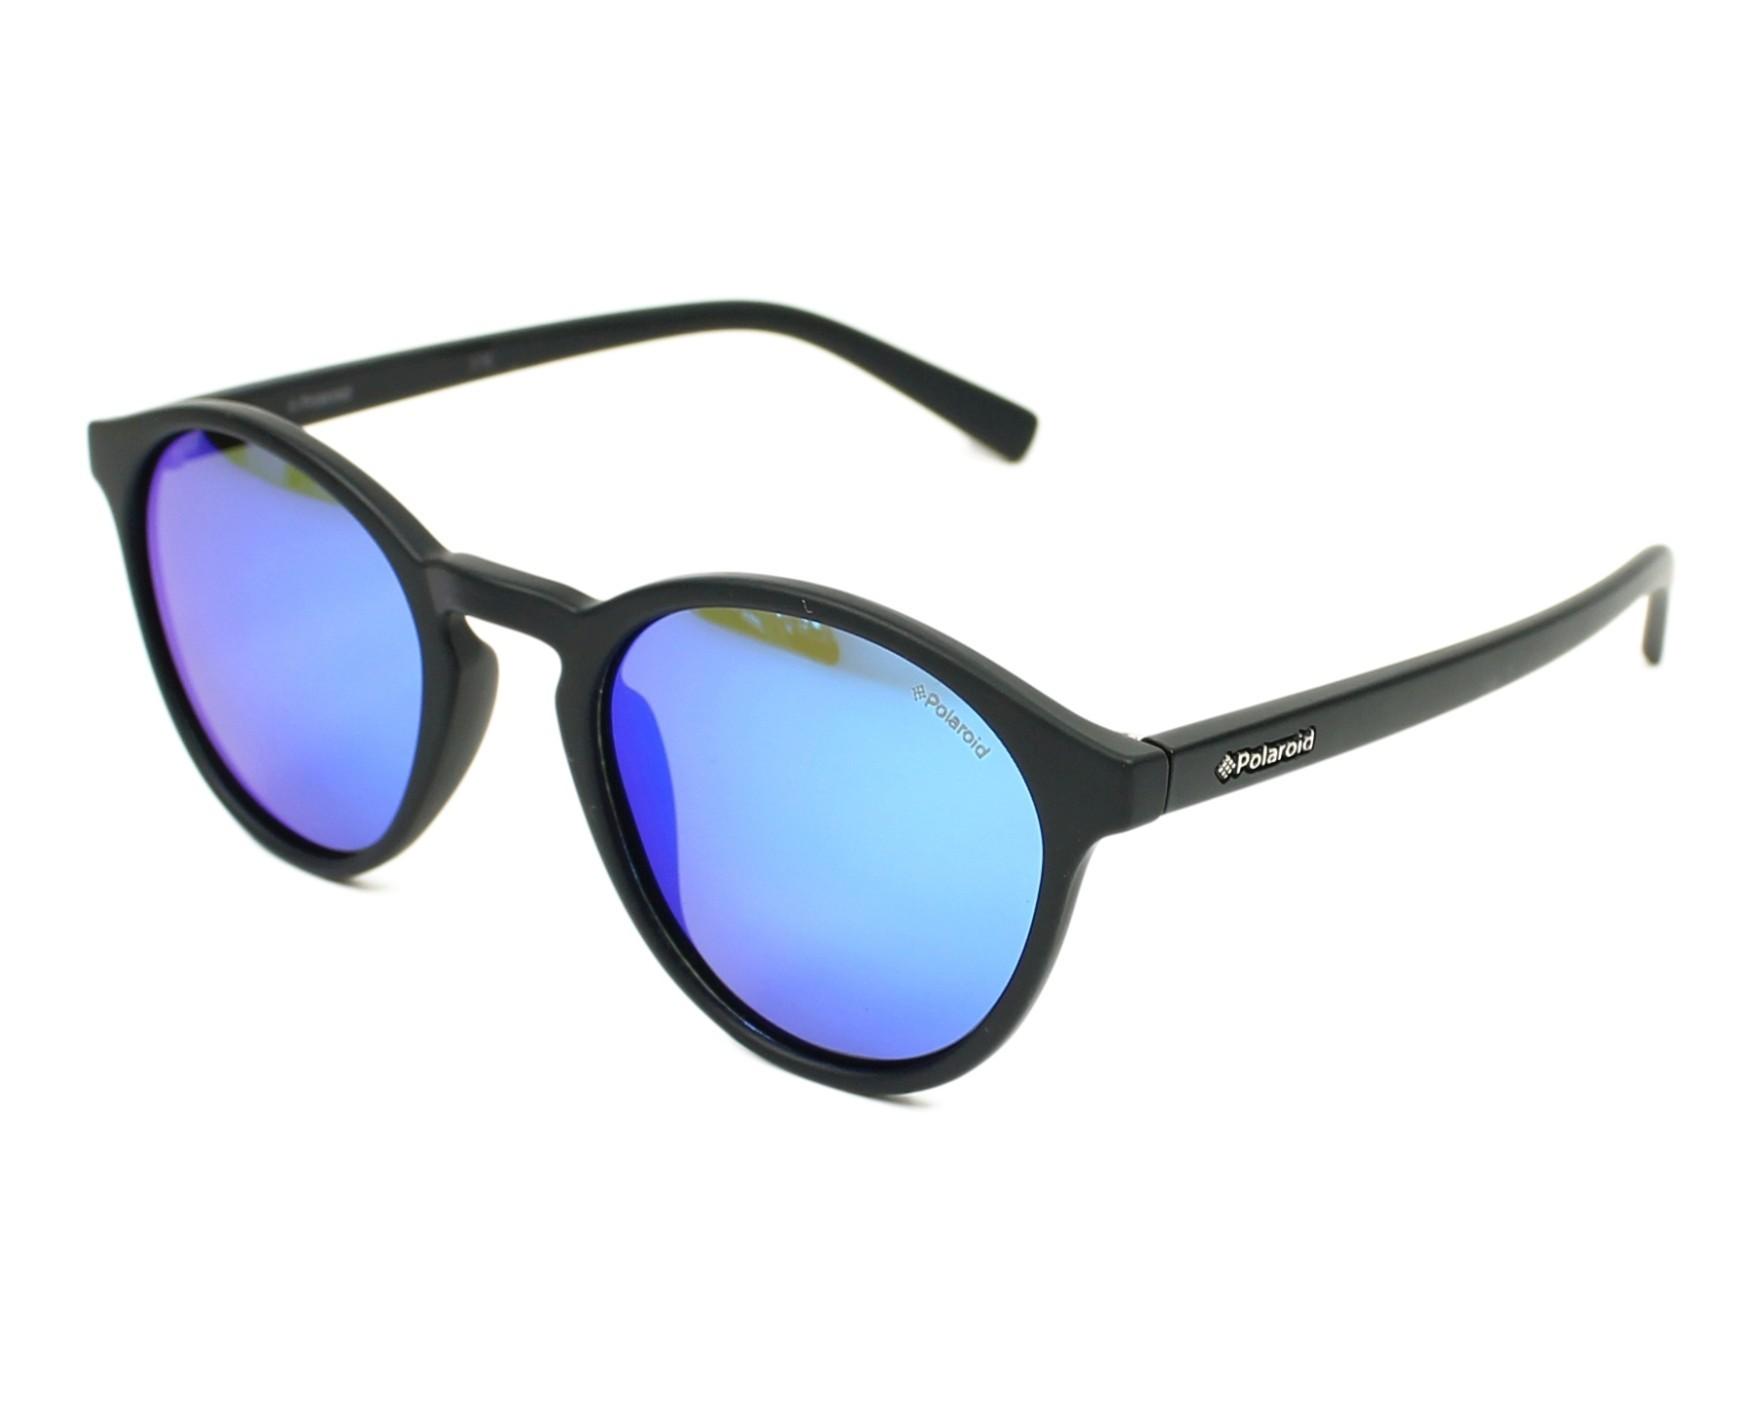 6379ac78ad9 Sunglasses Polaroid PLD-6013-S DL5 JY 50-22 Black profile view